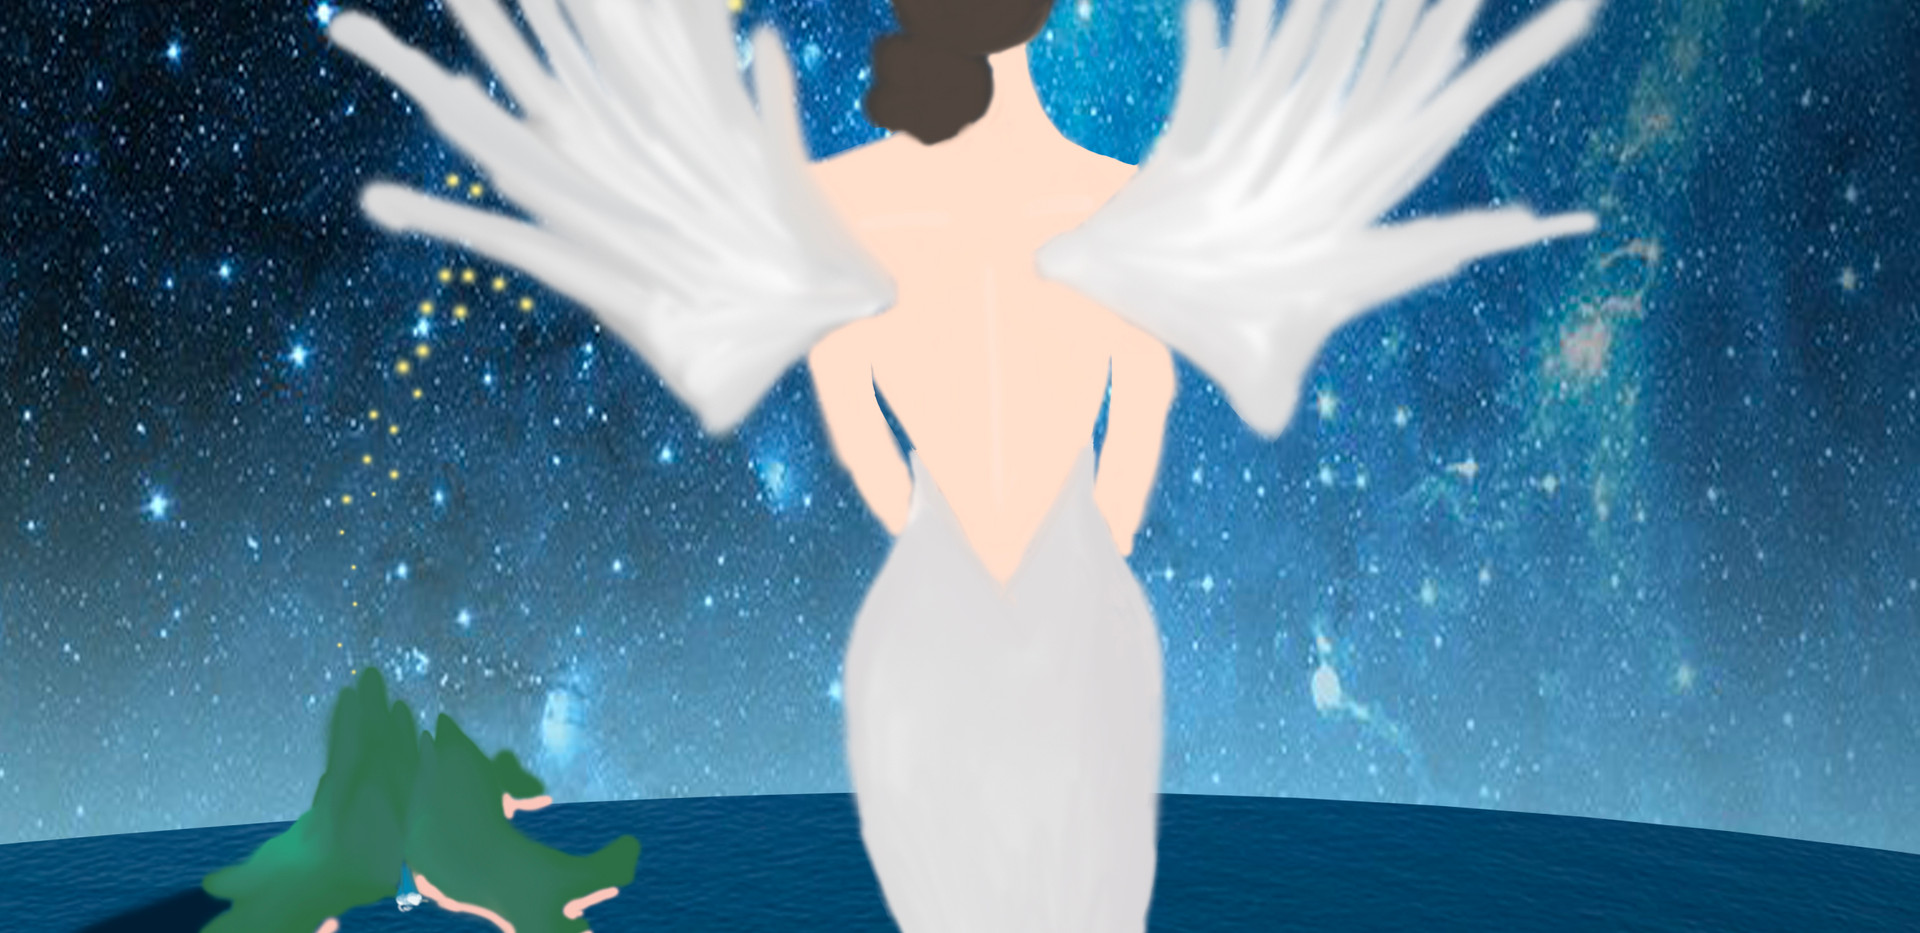 Alaura's Mythical Creature